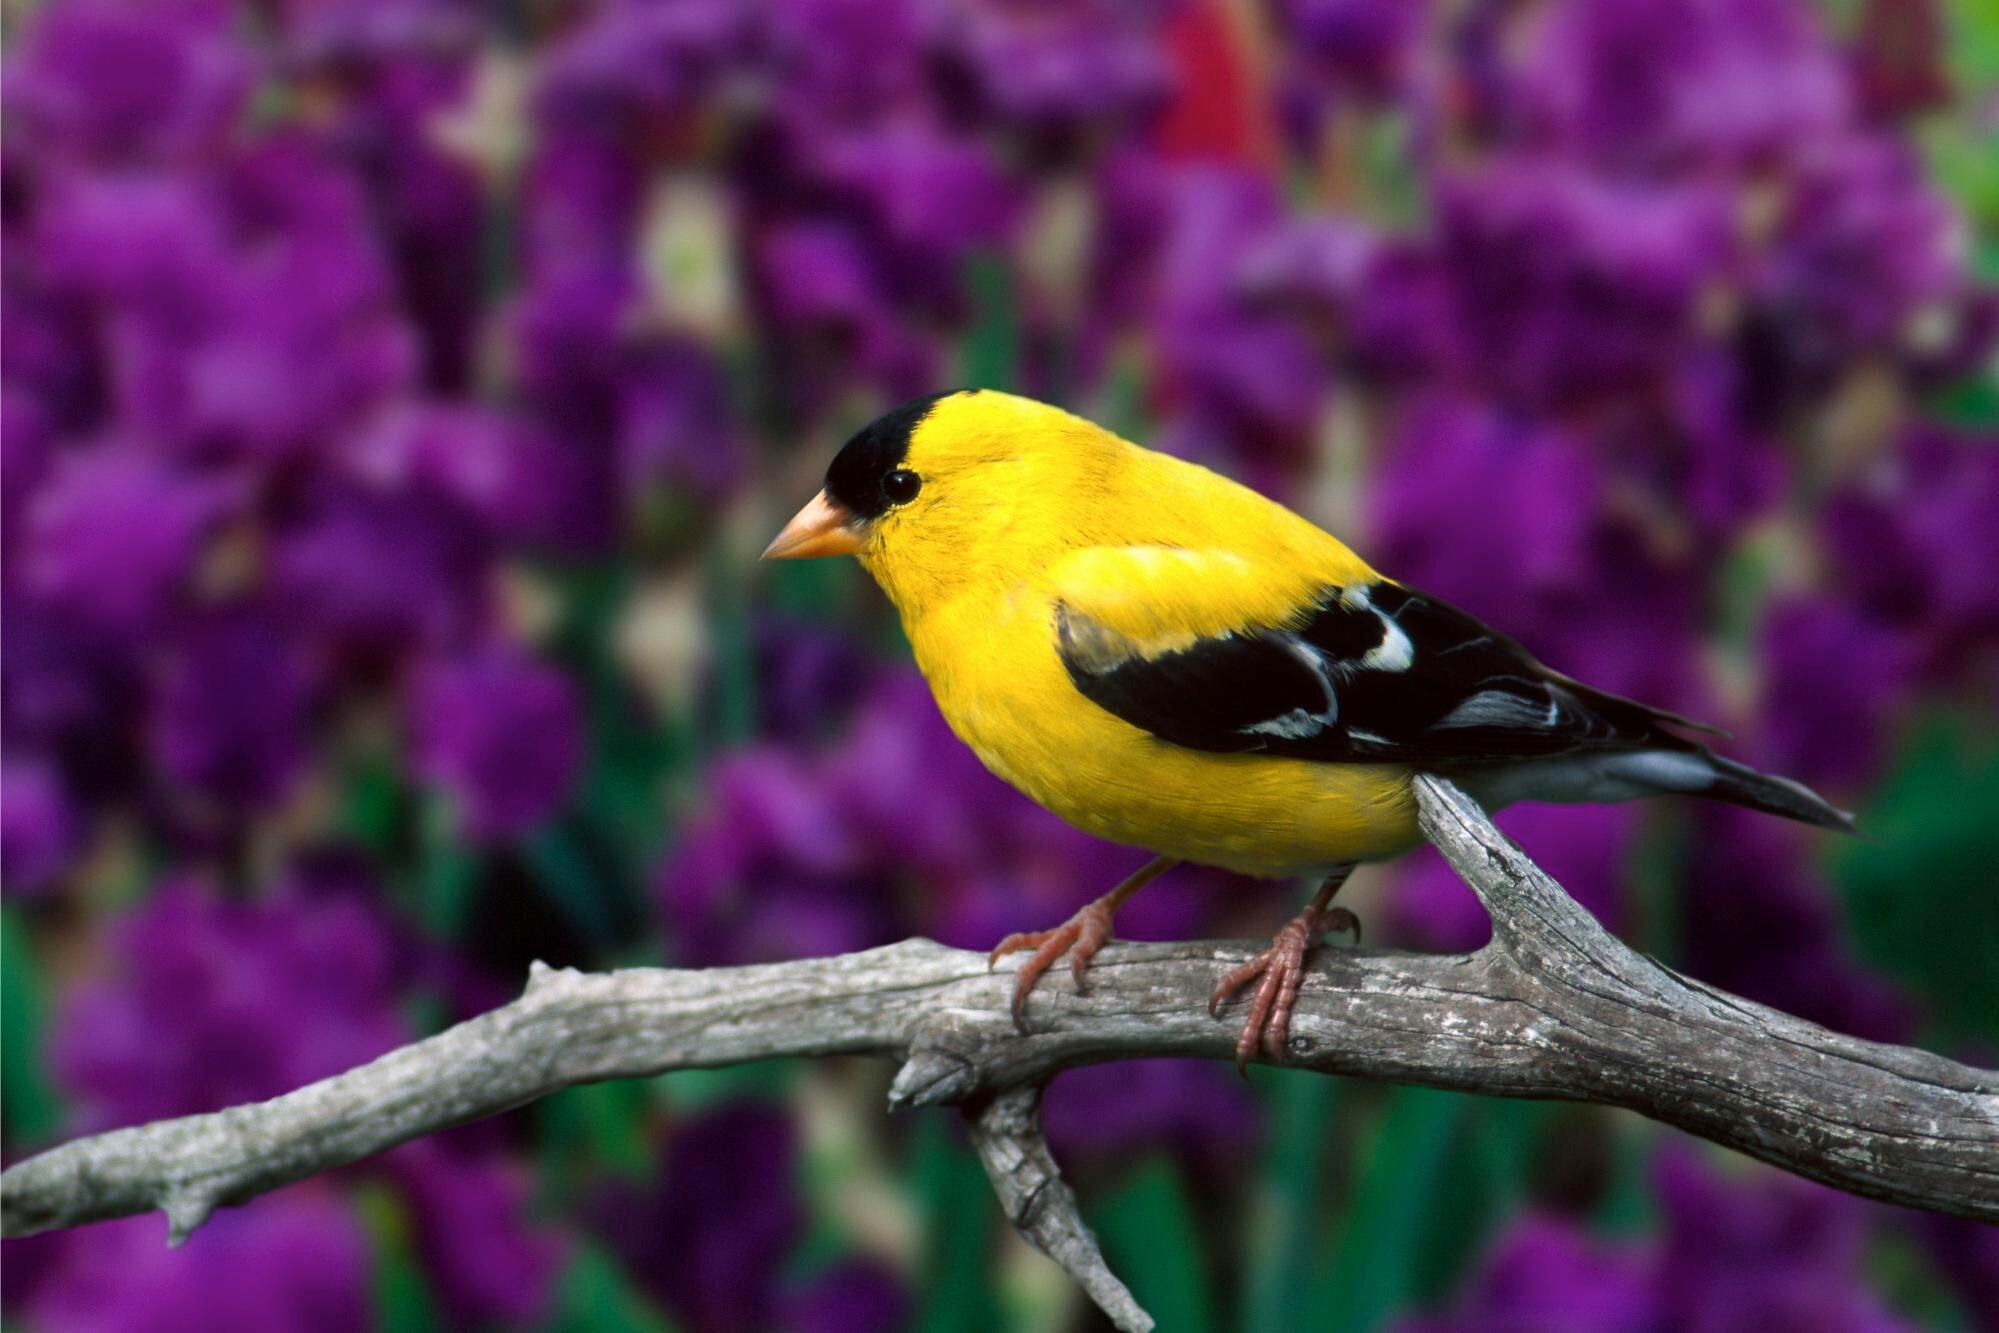 bird wallpapers | free download beautiful colorful hd desktop images